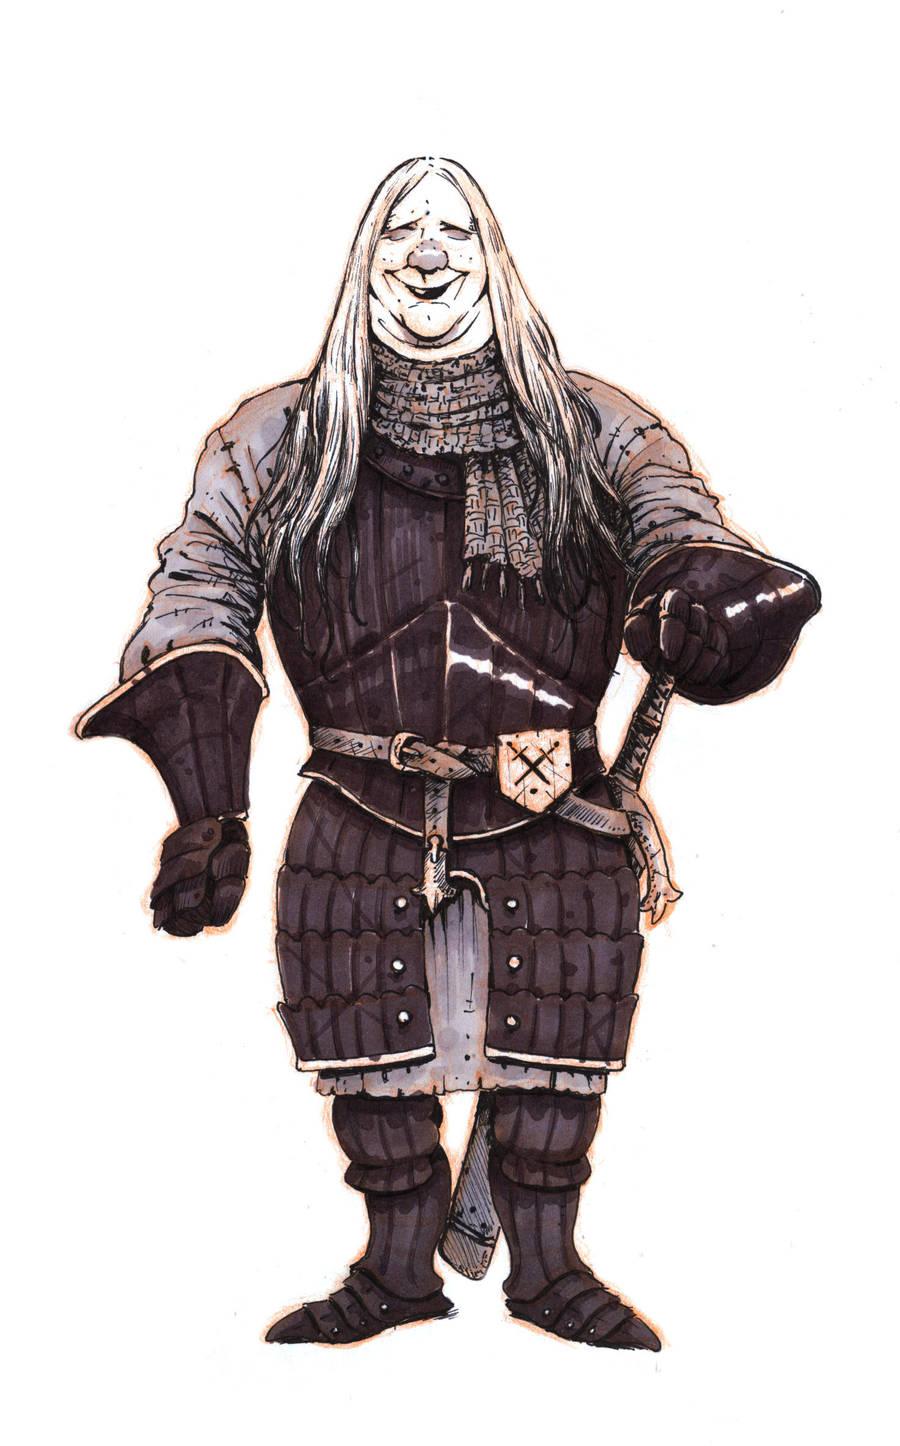 Inktober #7 - Mercenary by eoghankerrigan